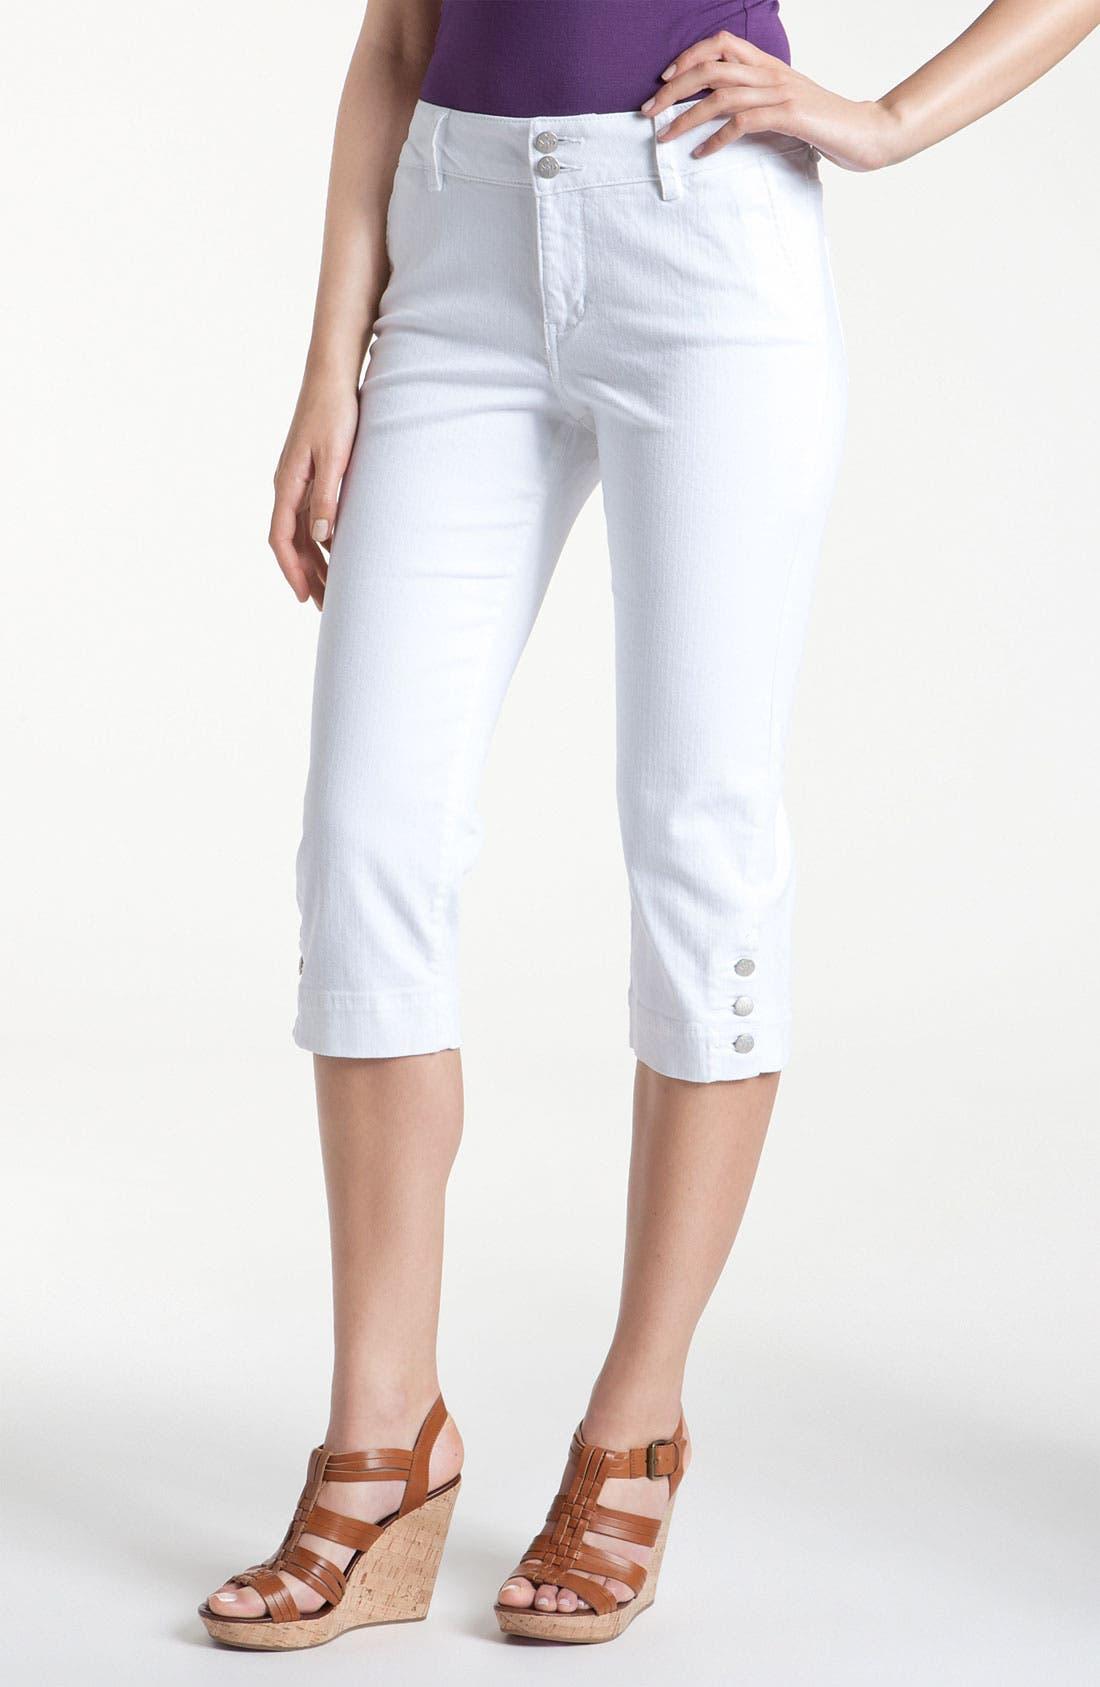 Main Image - NYDJ 'Cameron' Crop Stretch Jeans